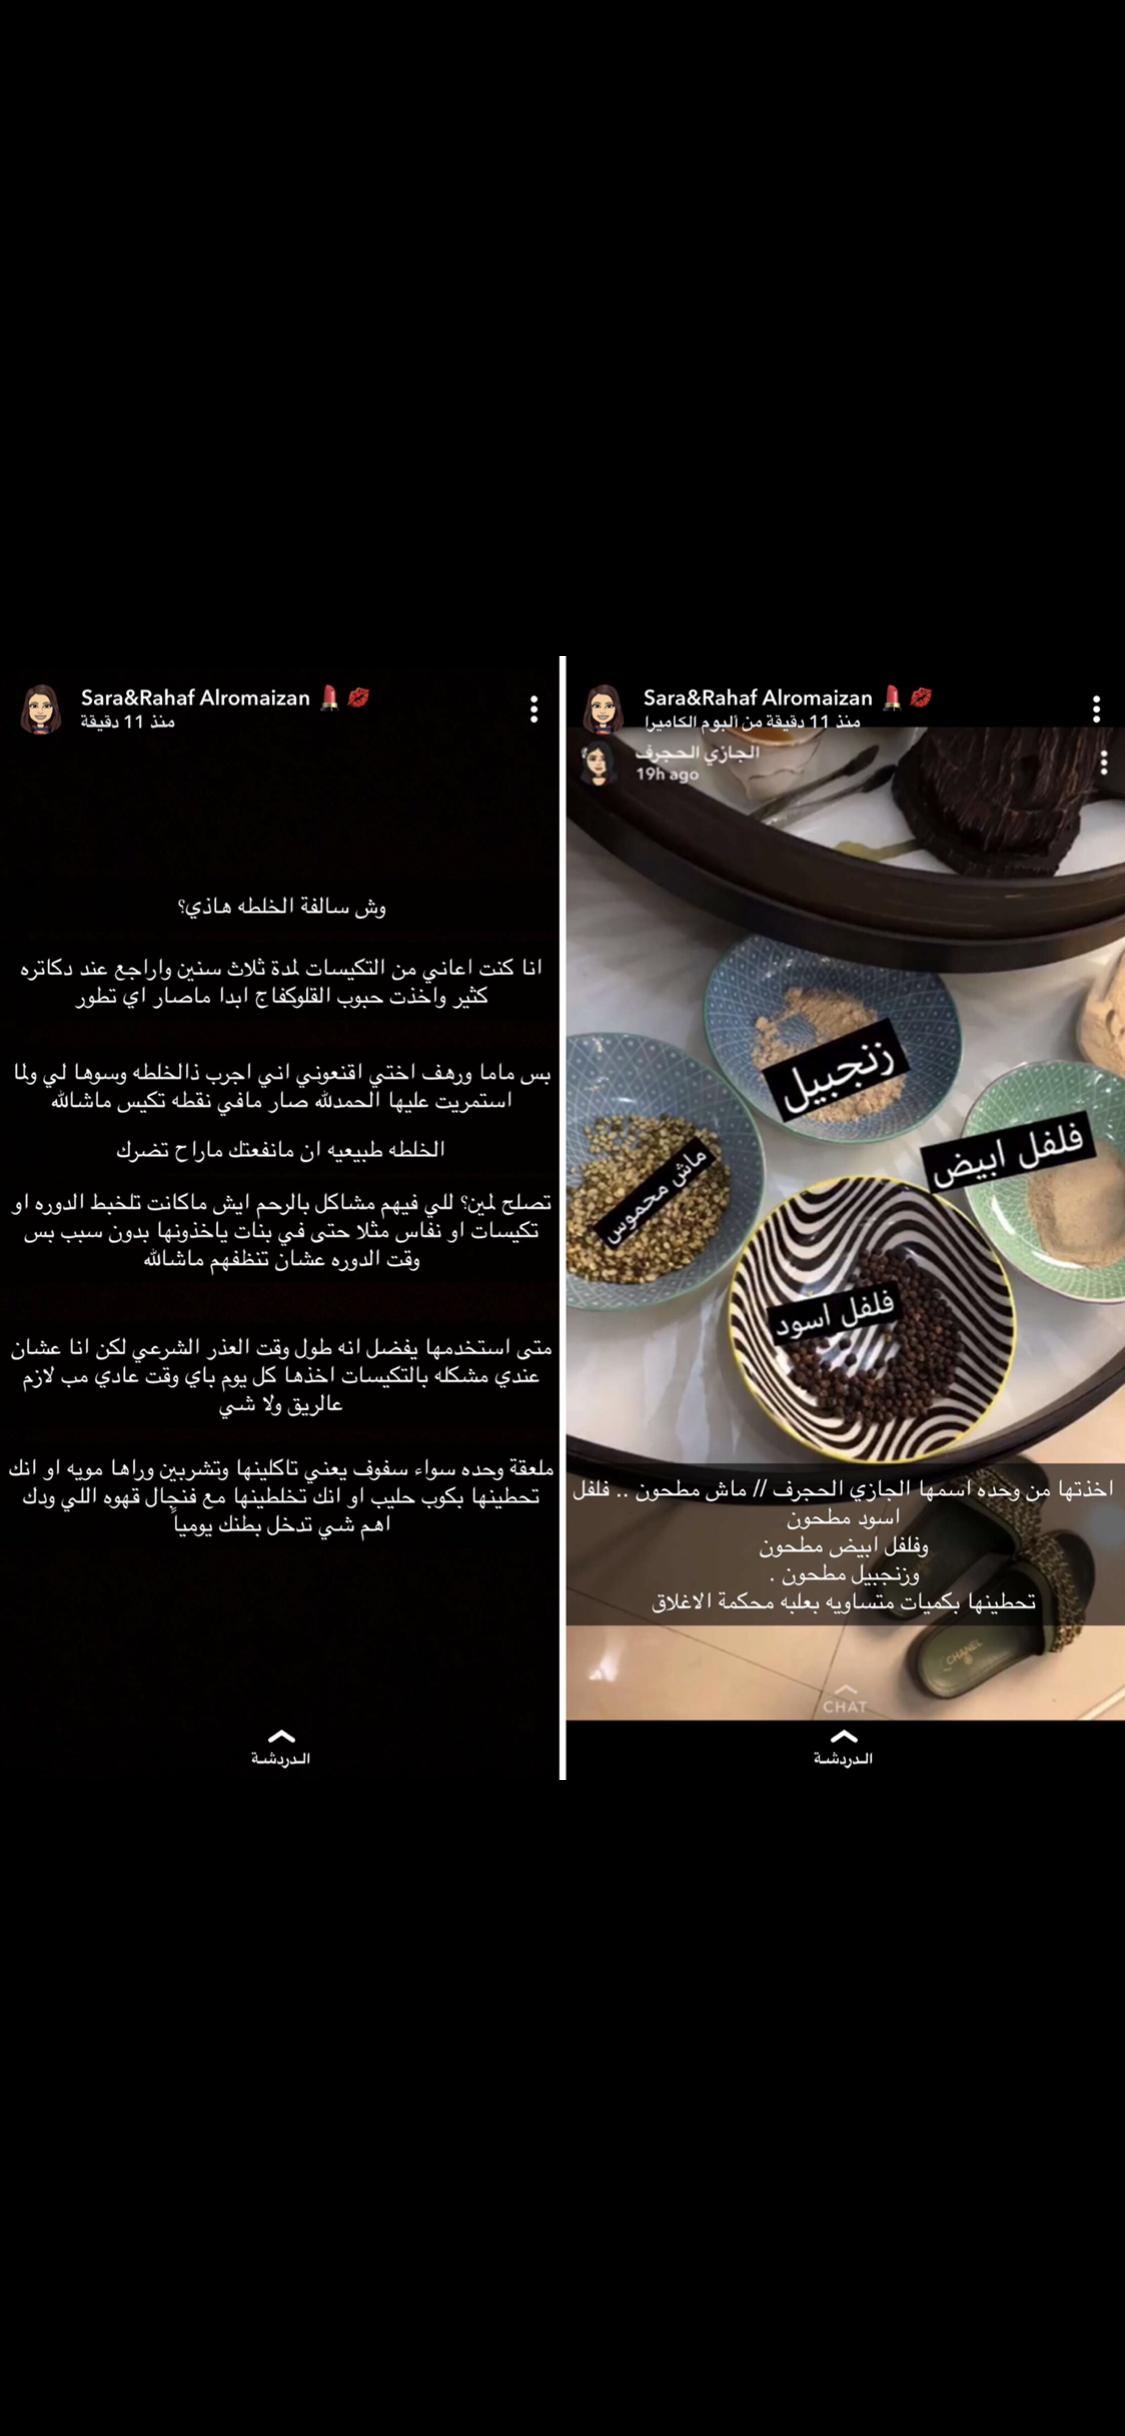 Pin By Rinad On Cooking Lockscreen Movie Posters Lockscreen Screenshot